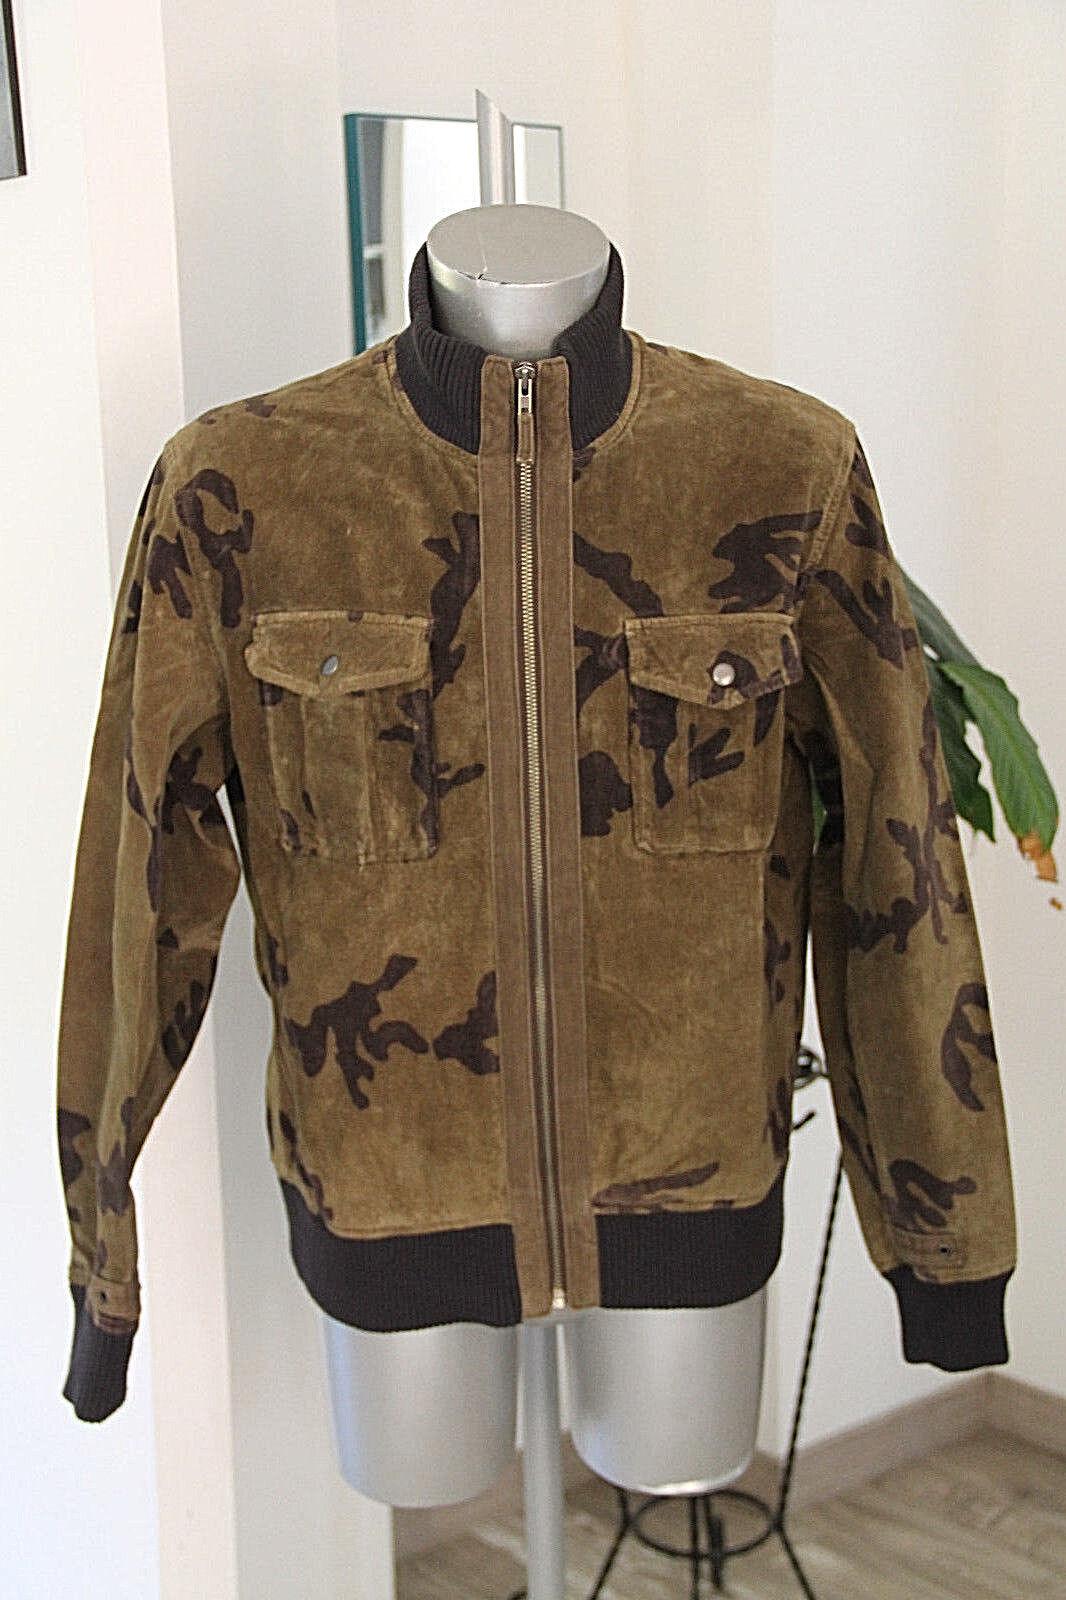 Bonito chaqueta de piel camuflaje hombre CHEVIGNON talla XL Muy buen estado